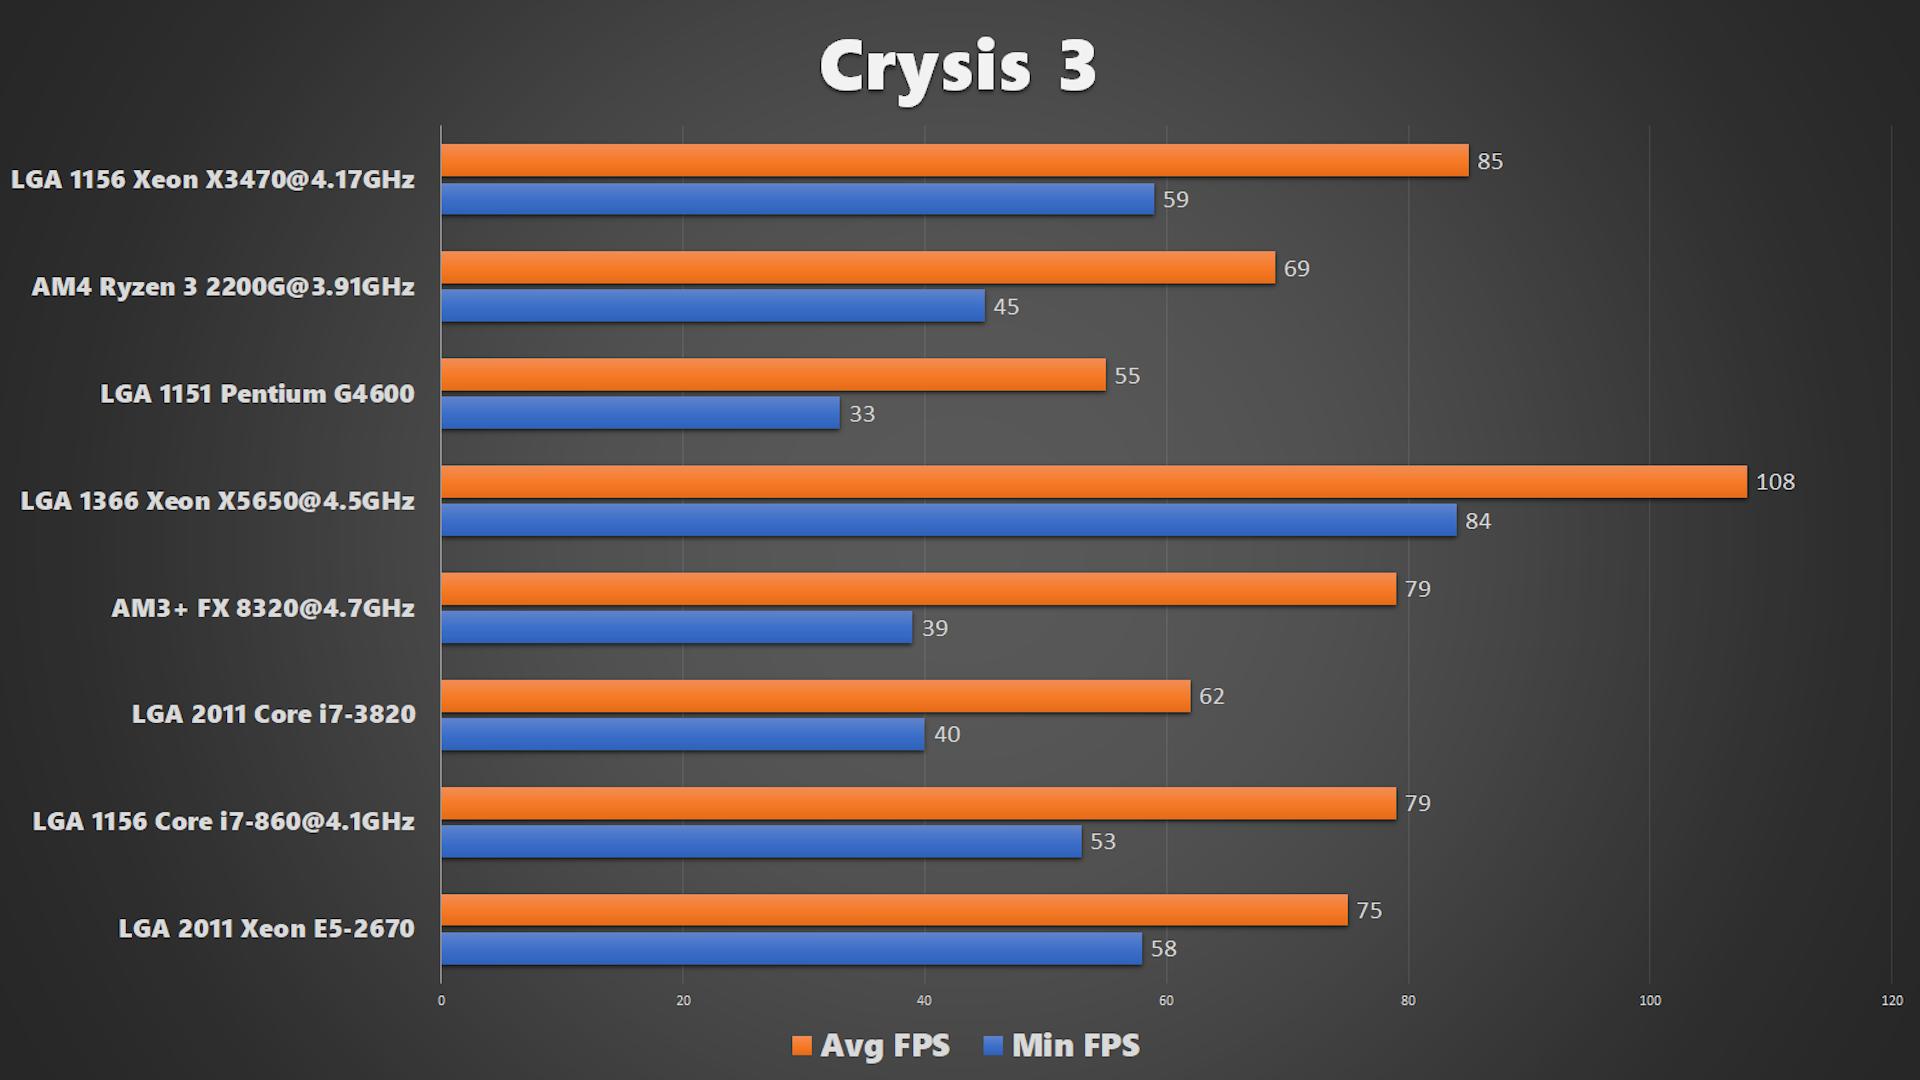 Crysis 3.png